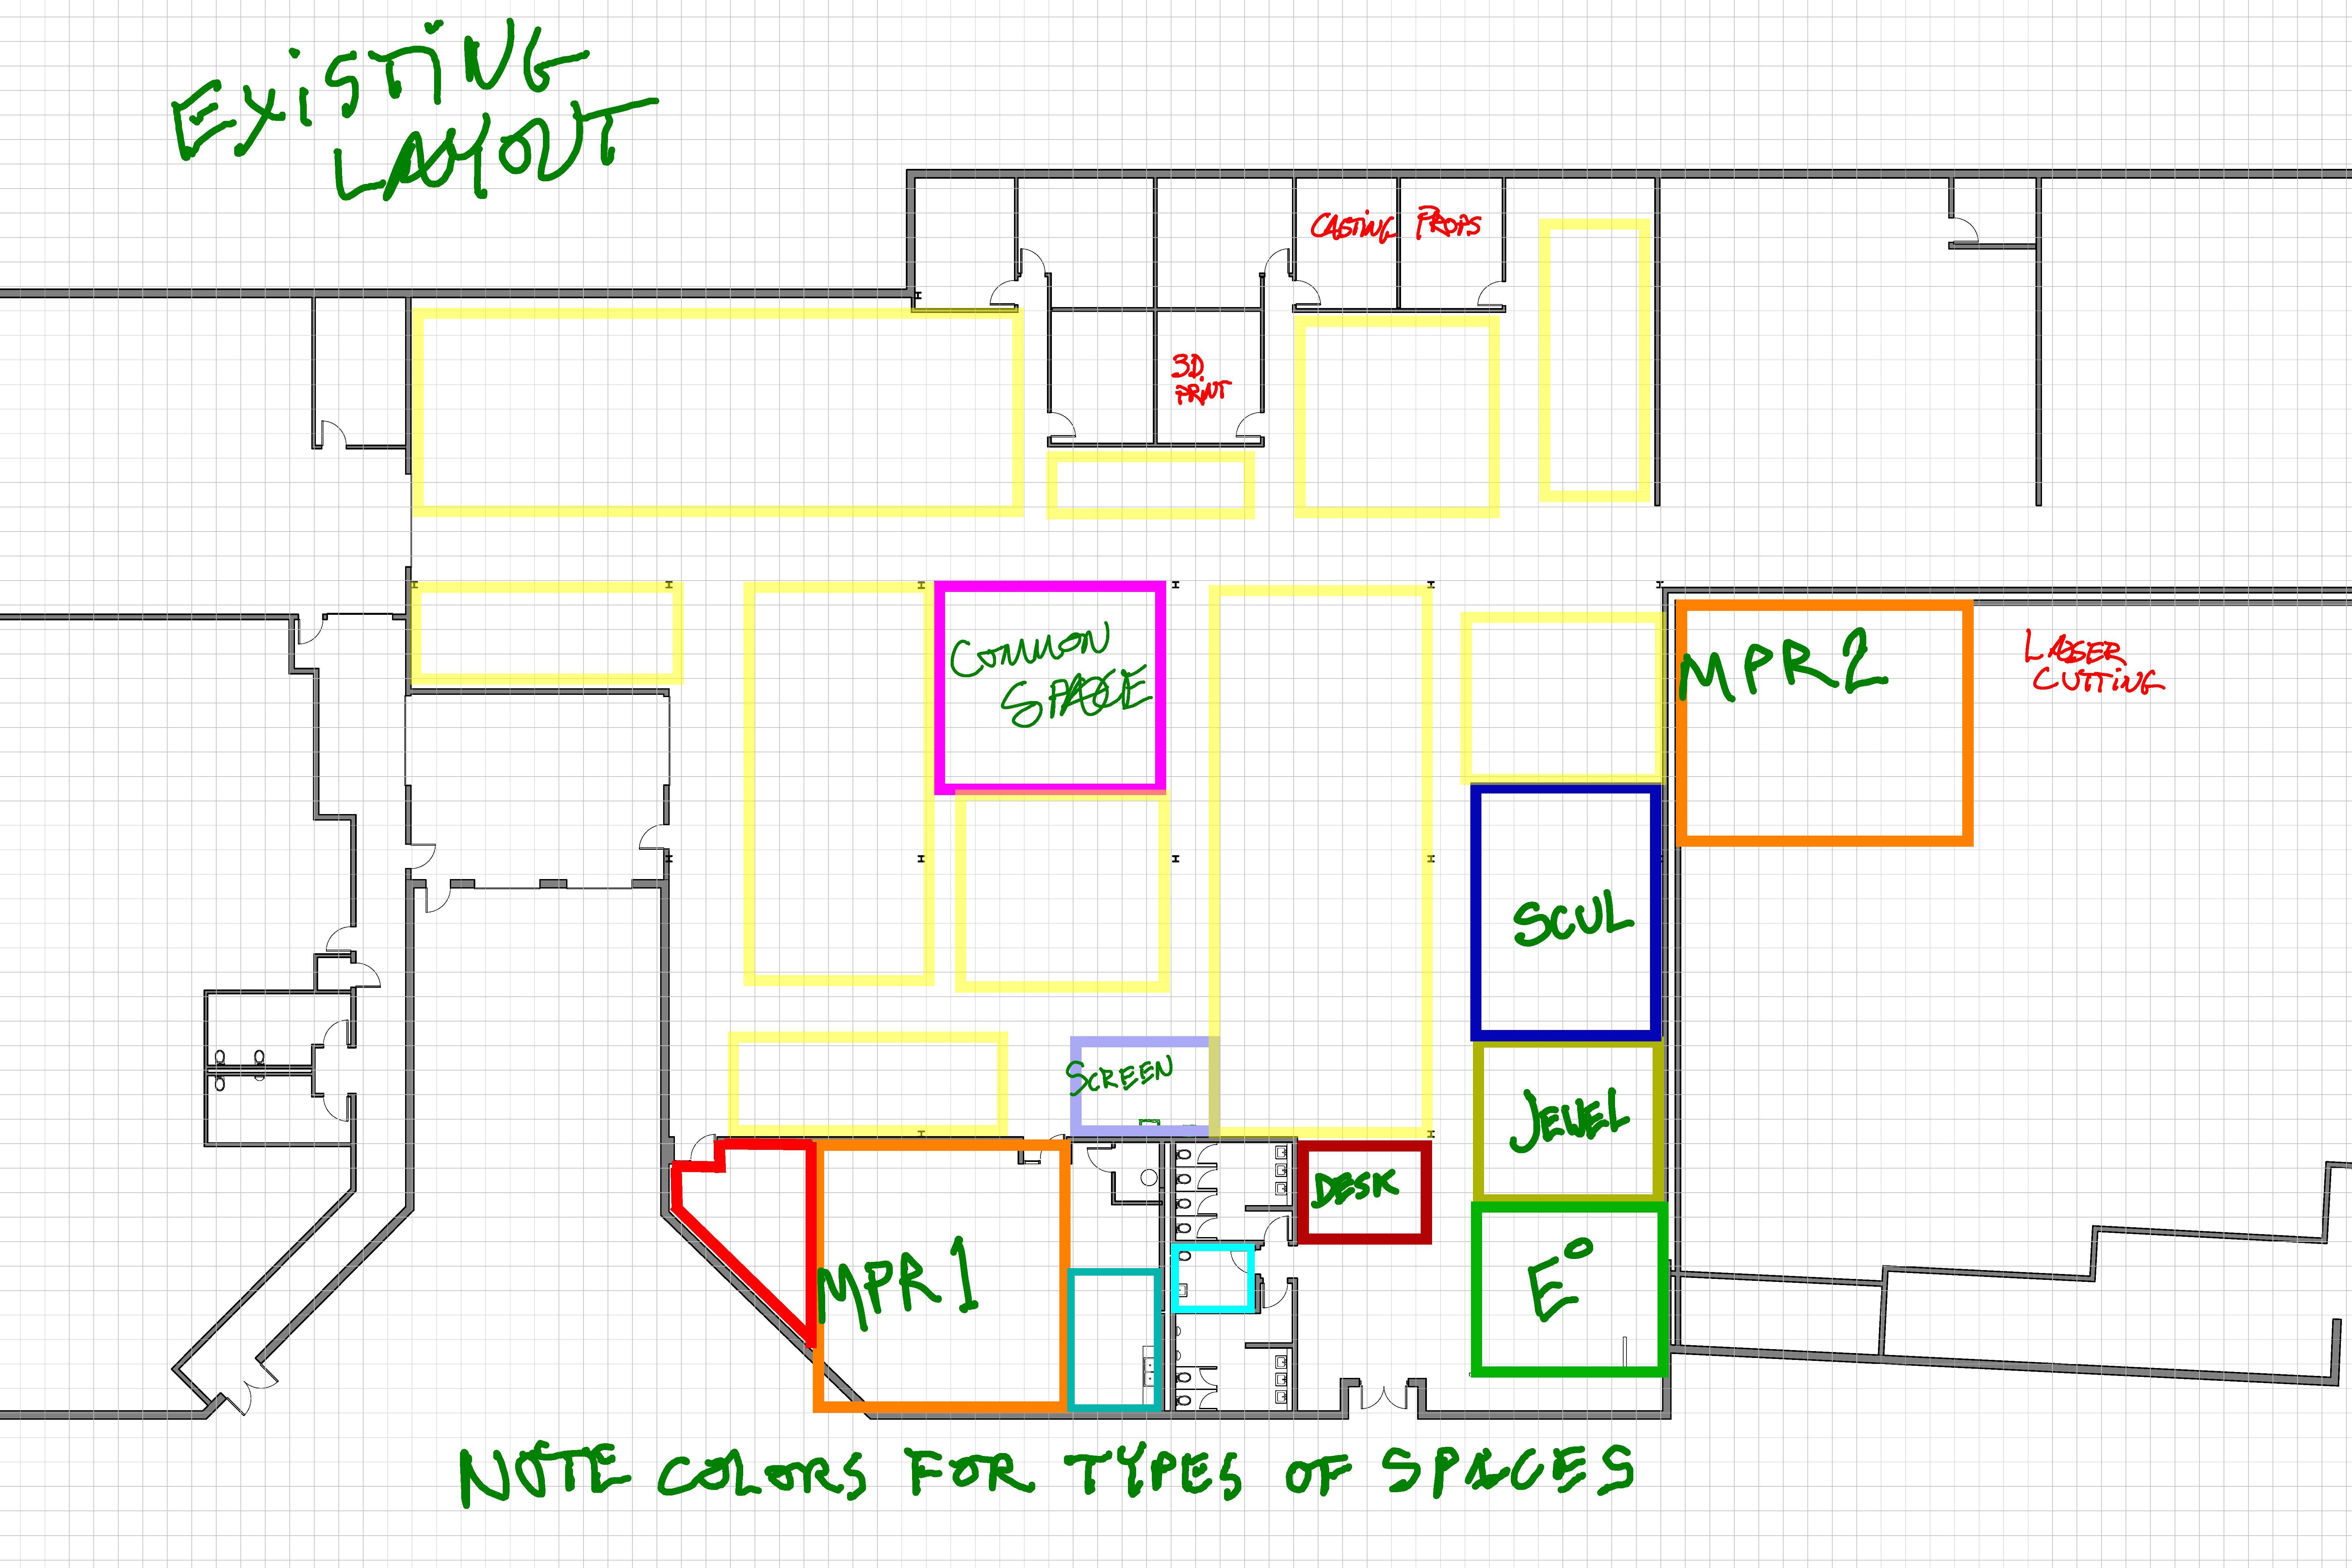 170419 - AAsylum Sketch BG-Copy_Page_2